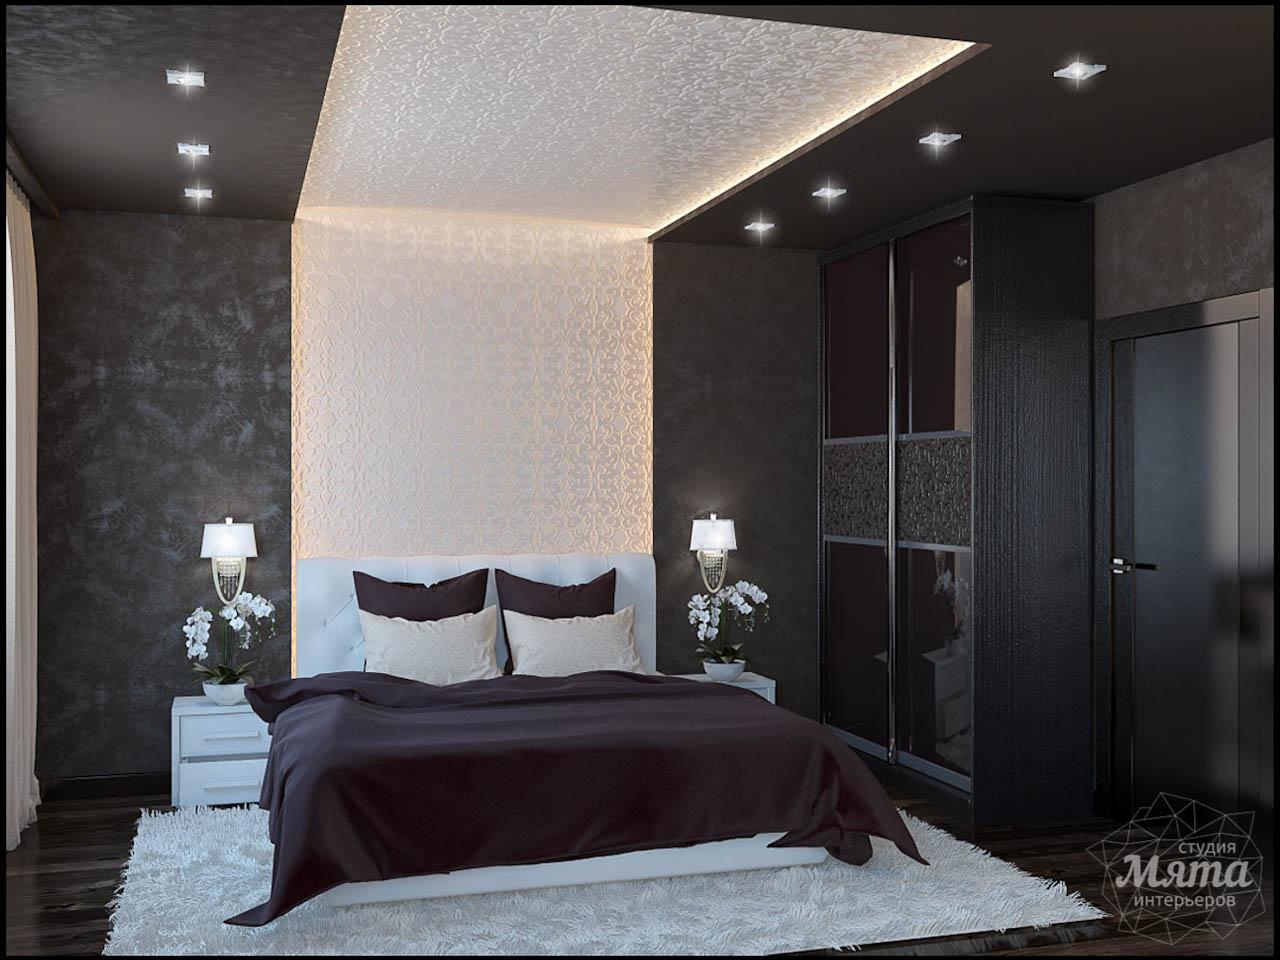 Дизайн интерьера и ремонт трехкомнатной квартиры по ул. 8 Марта 190 img1591673290